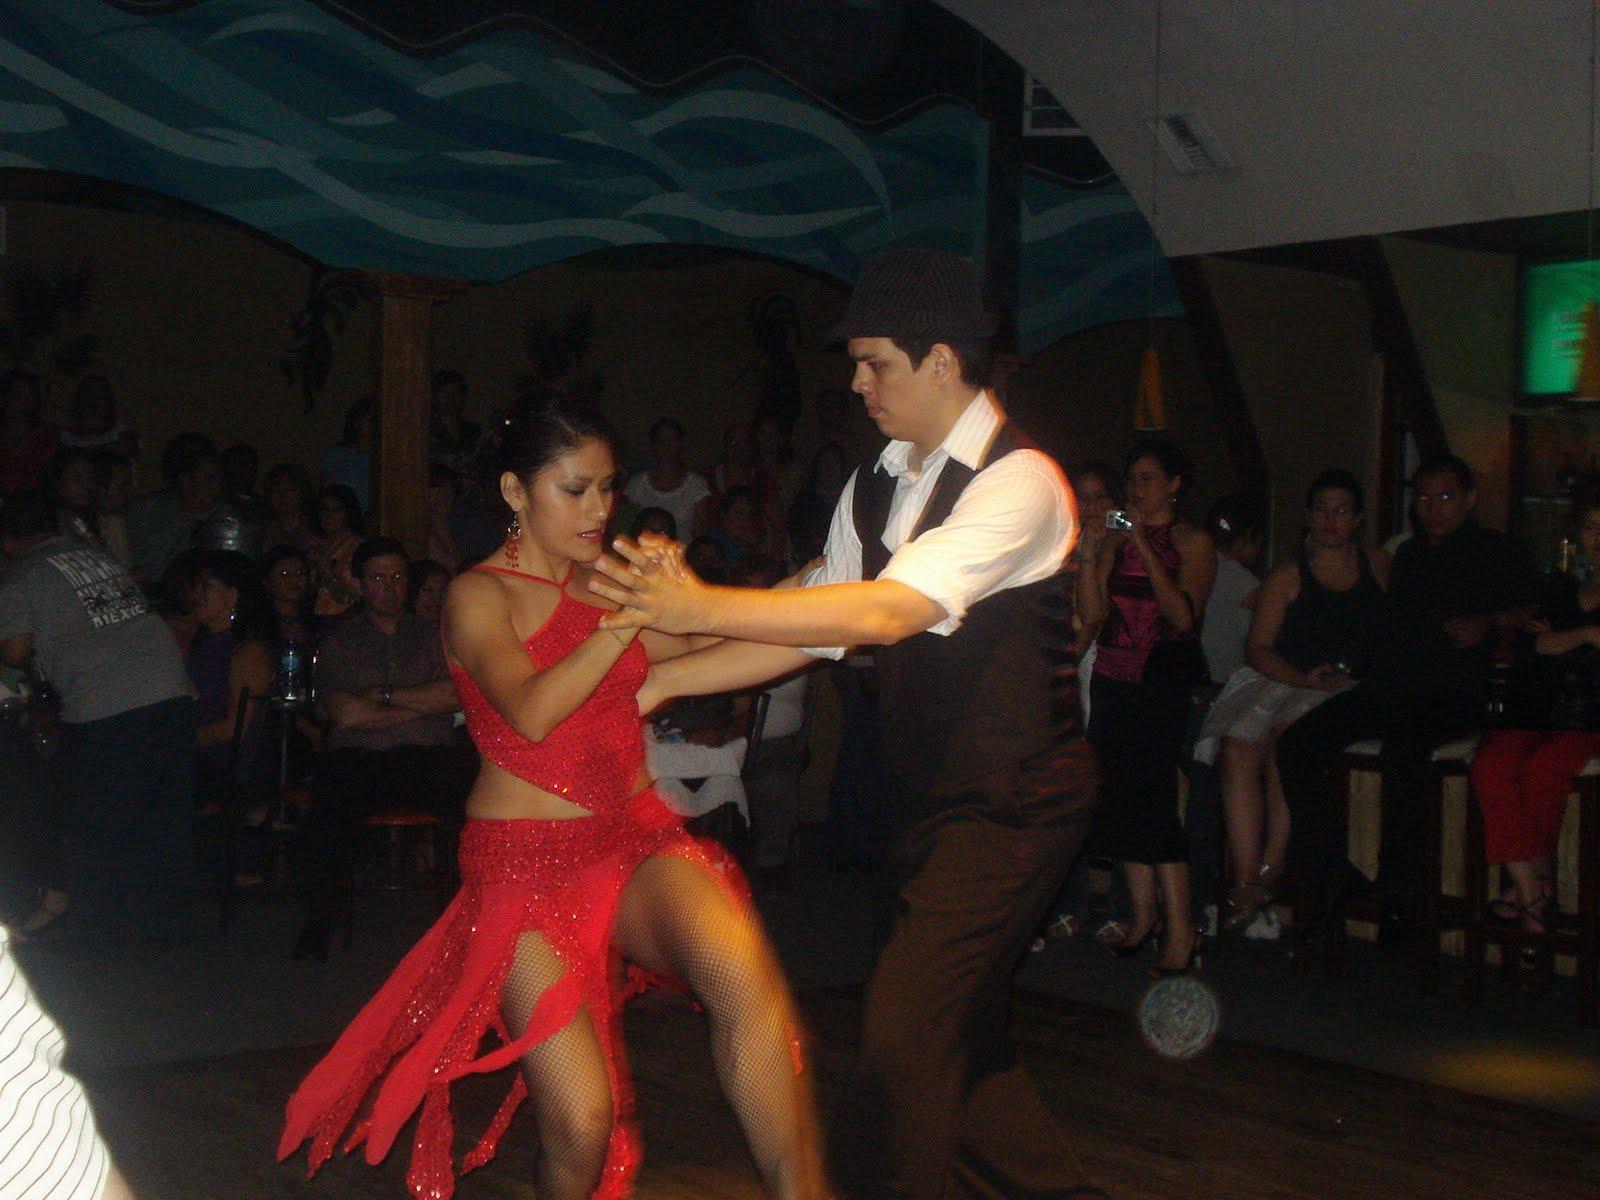 Baile de salon uabc for Battlefield 1 salon de baile